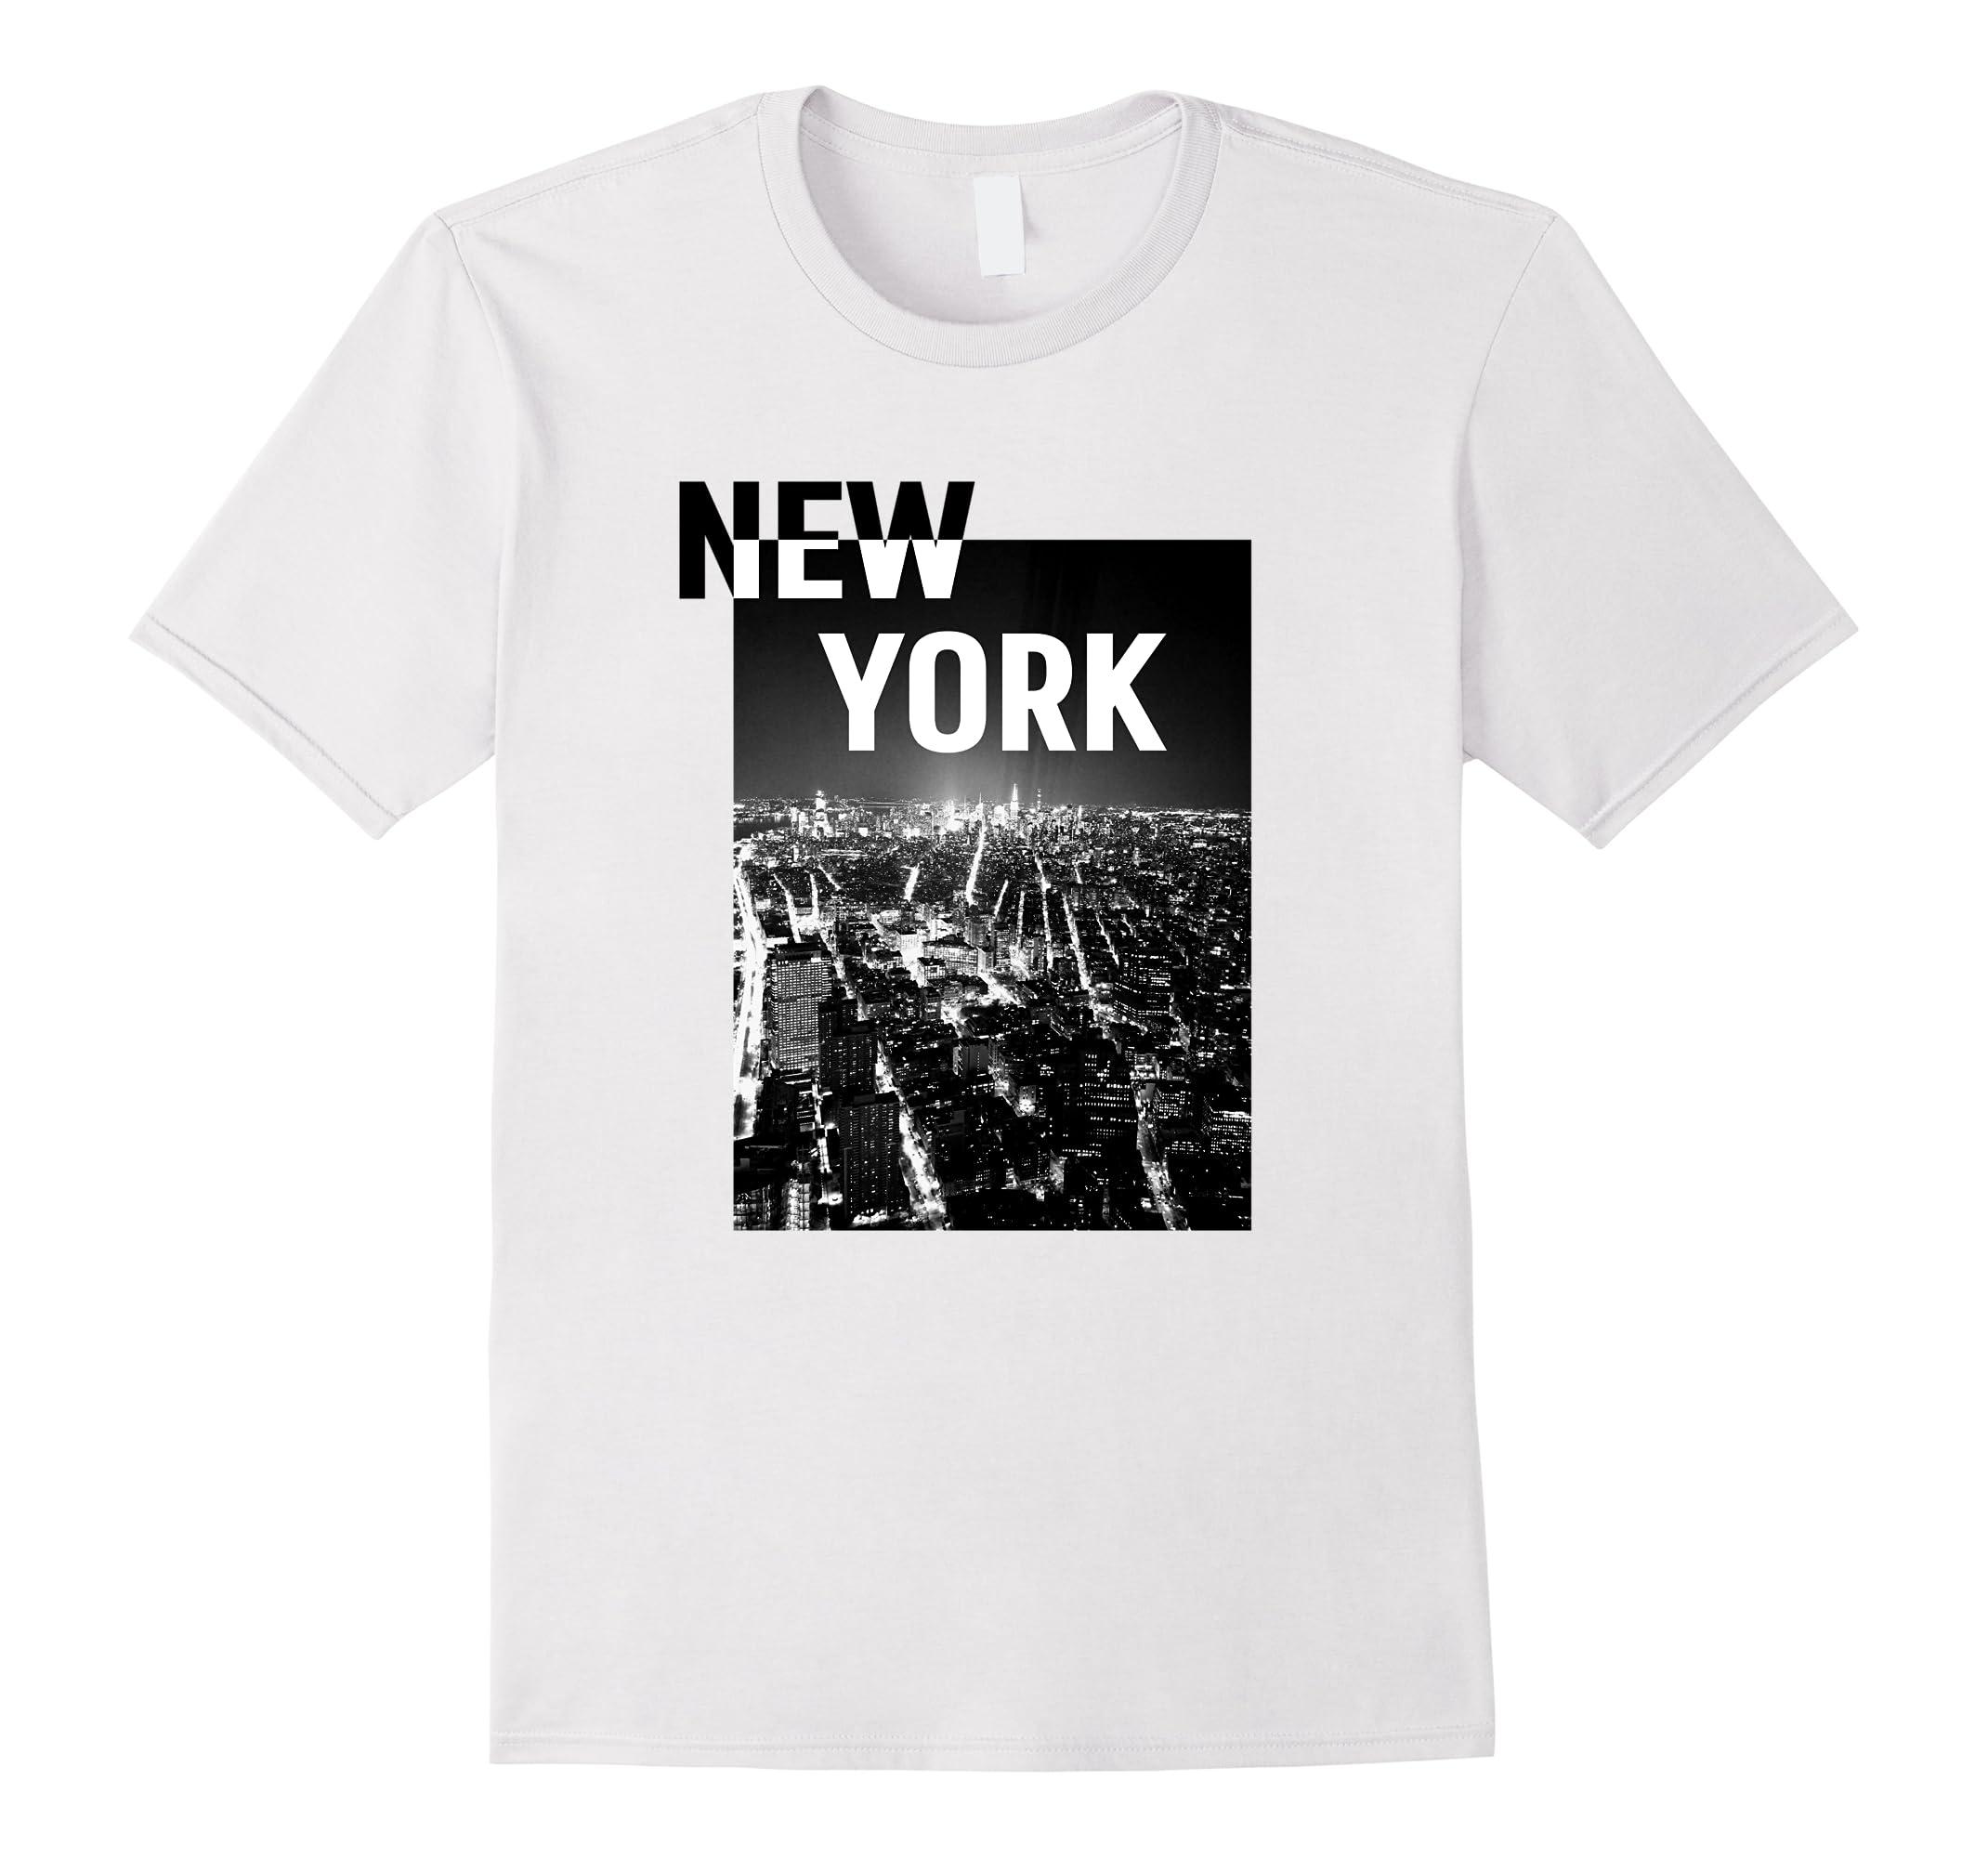 e162ab1df New York T-Shirt   New York TShirt T Shirt Gray Tee Shirt-RT ...